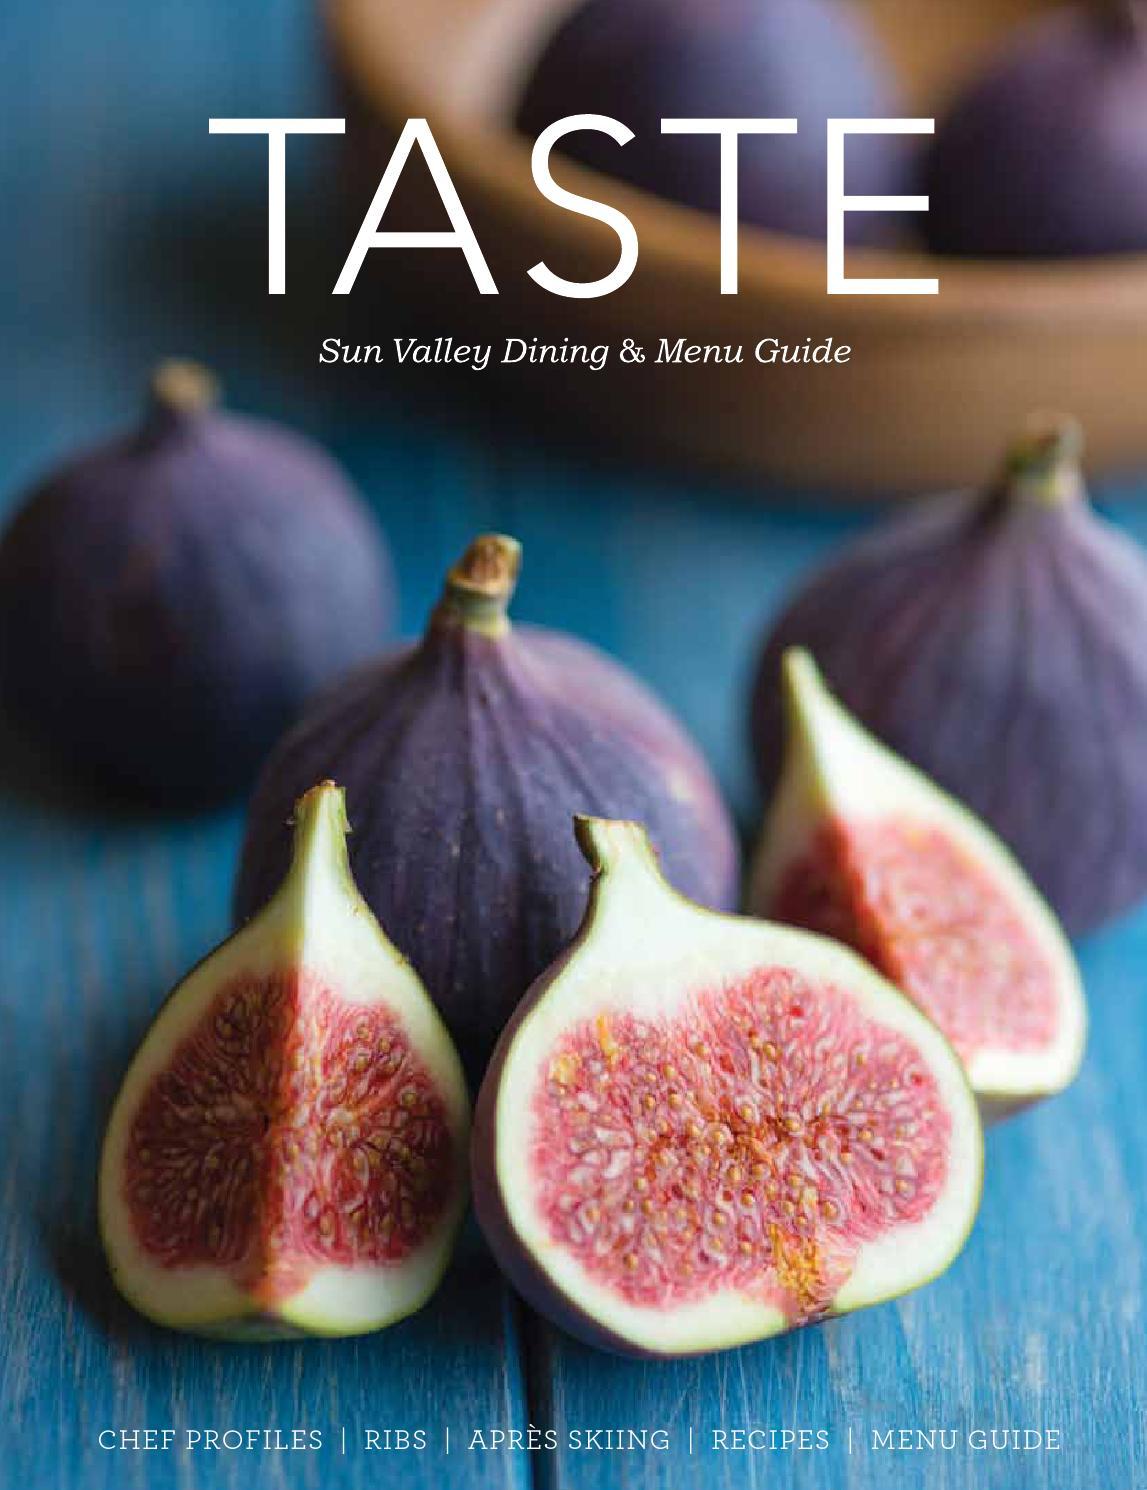 TASTE Sun Valley Dining U0026 Menu Guide By Sun Valley Magazine   Issuu